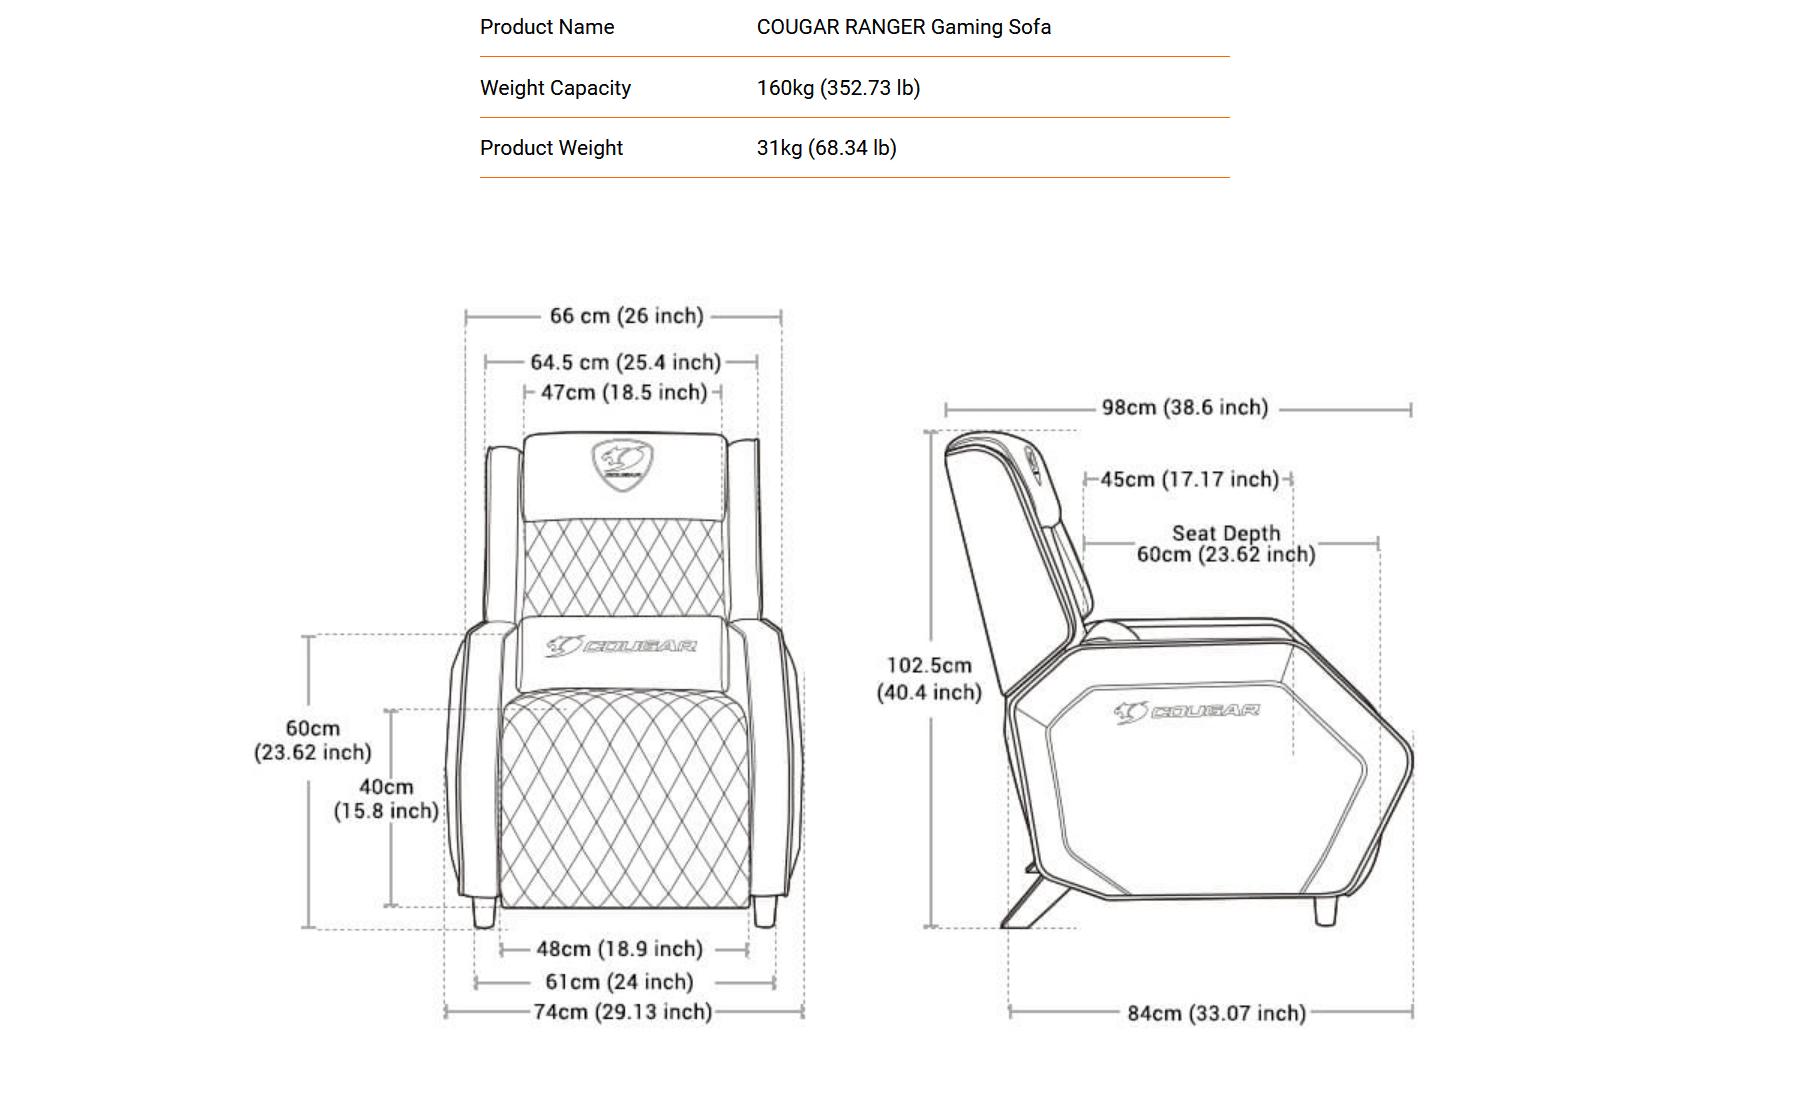 Cougar Ranger dimensions